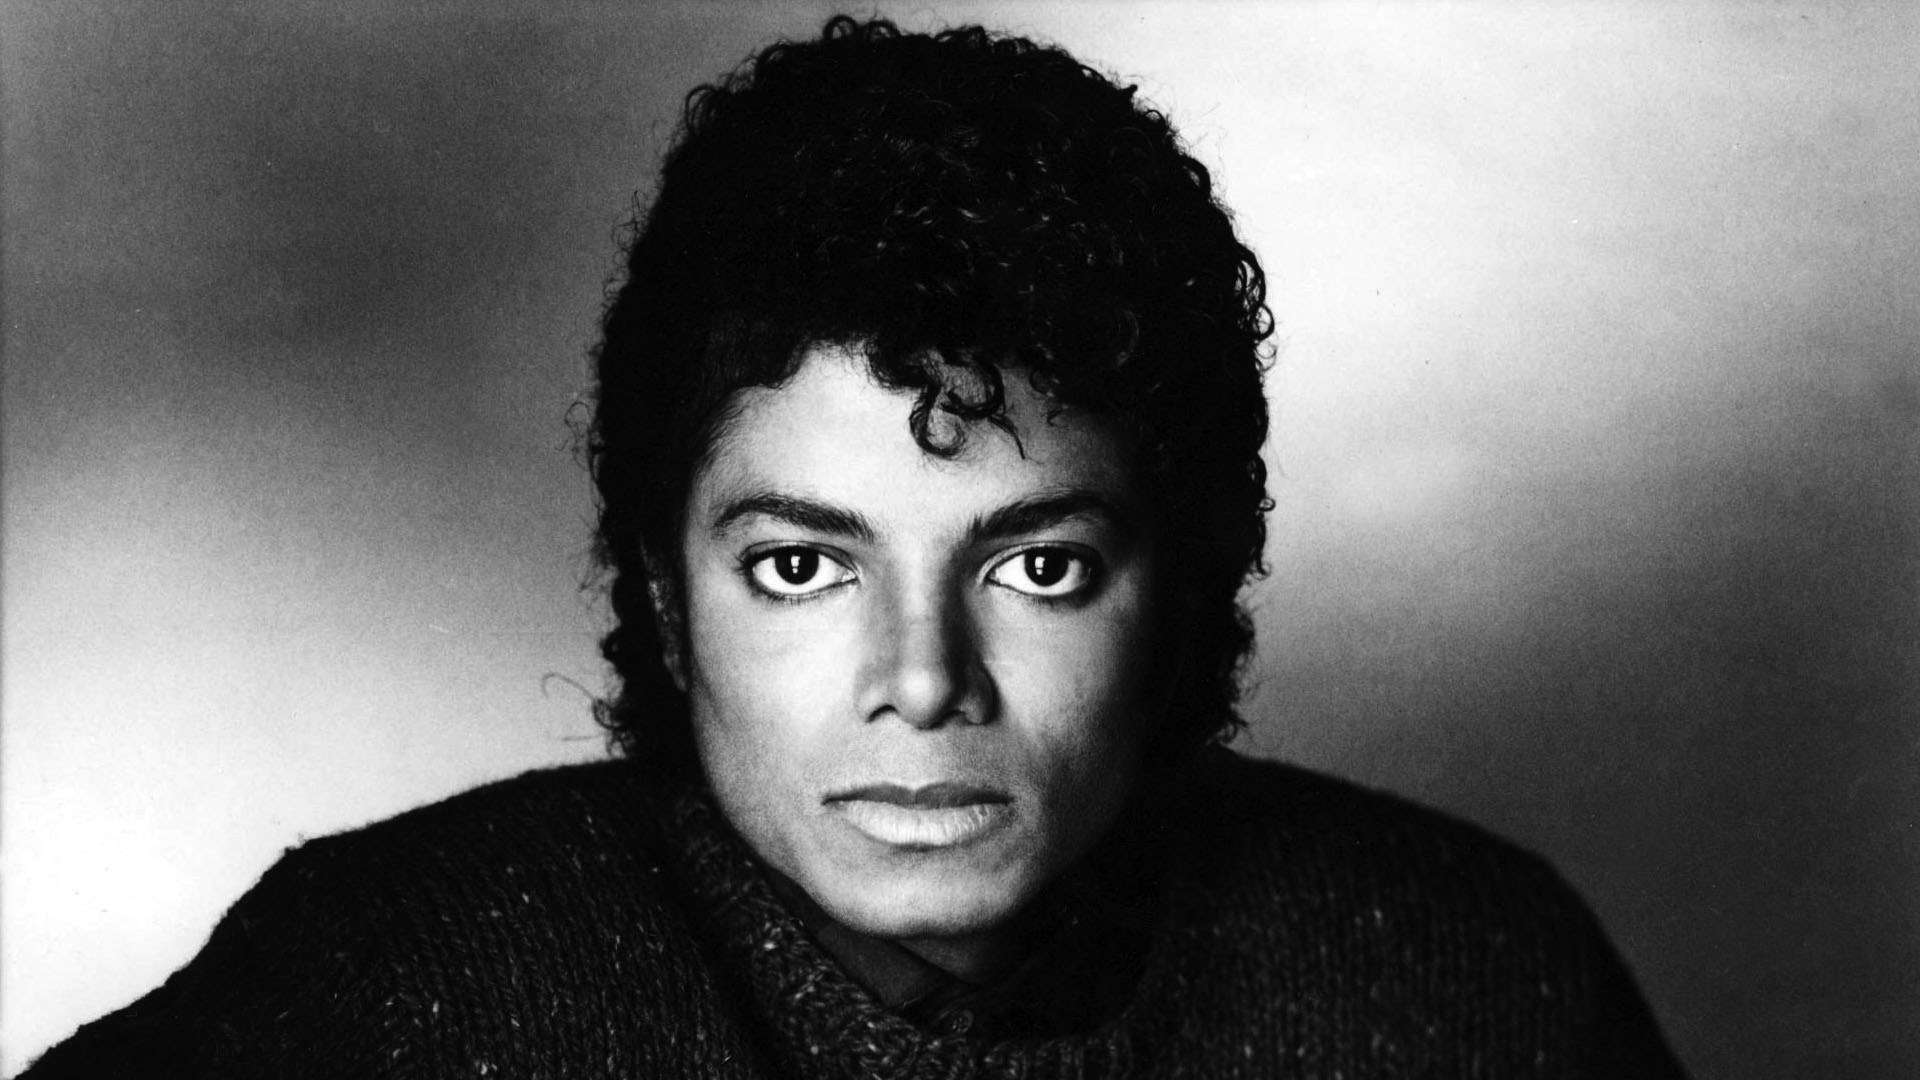 Michael Jackson Wallpaper 011